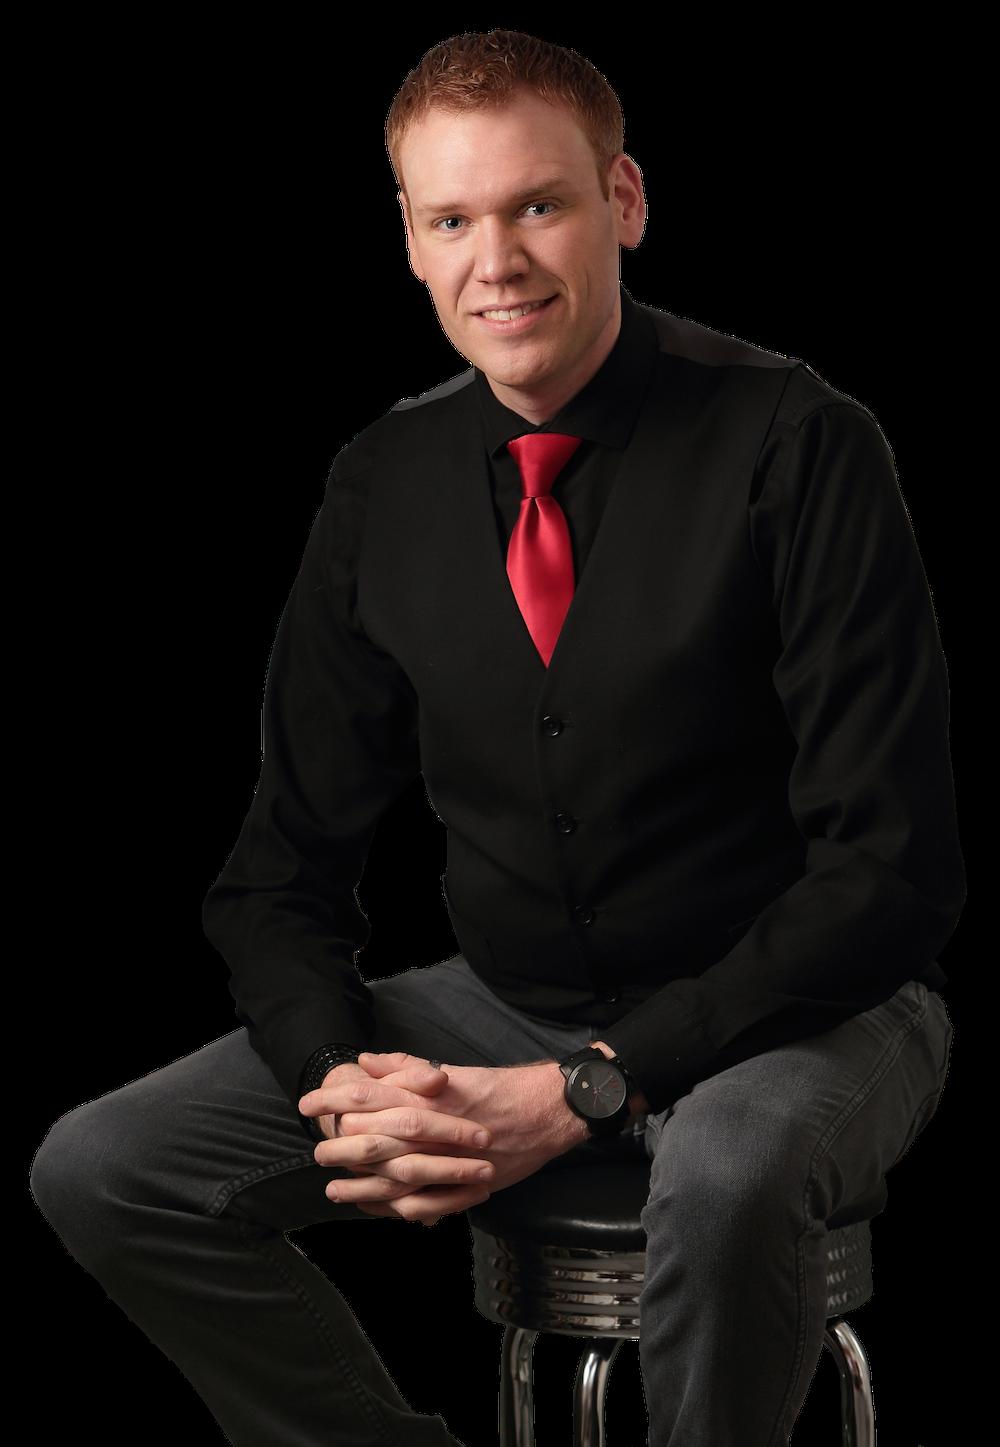 Jeff Veley Peace Ambassador Motivational Speaker clear copy.png